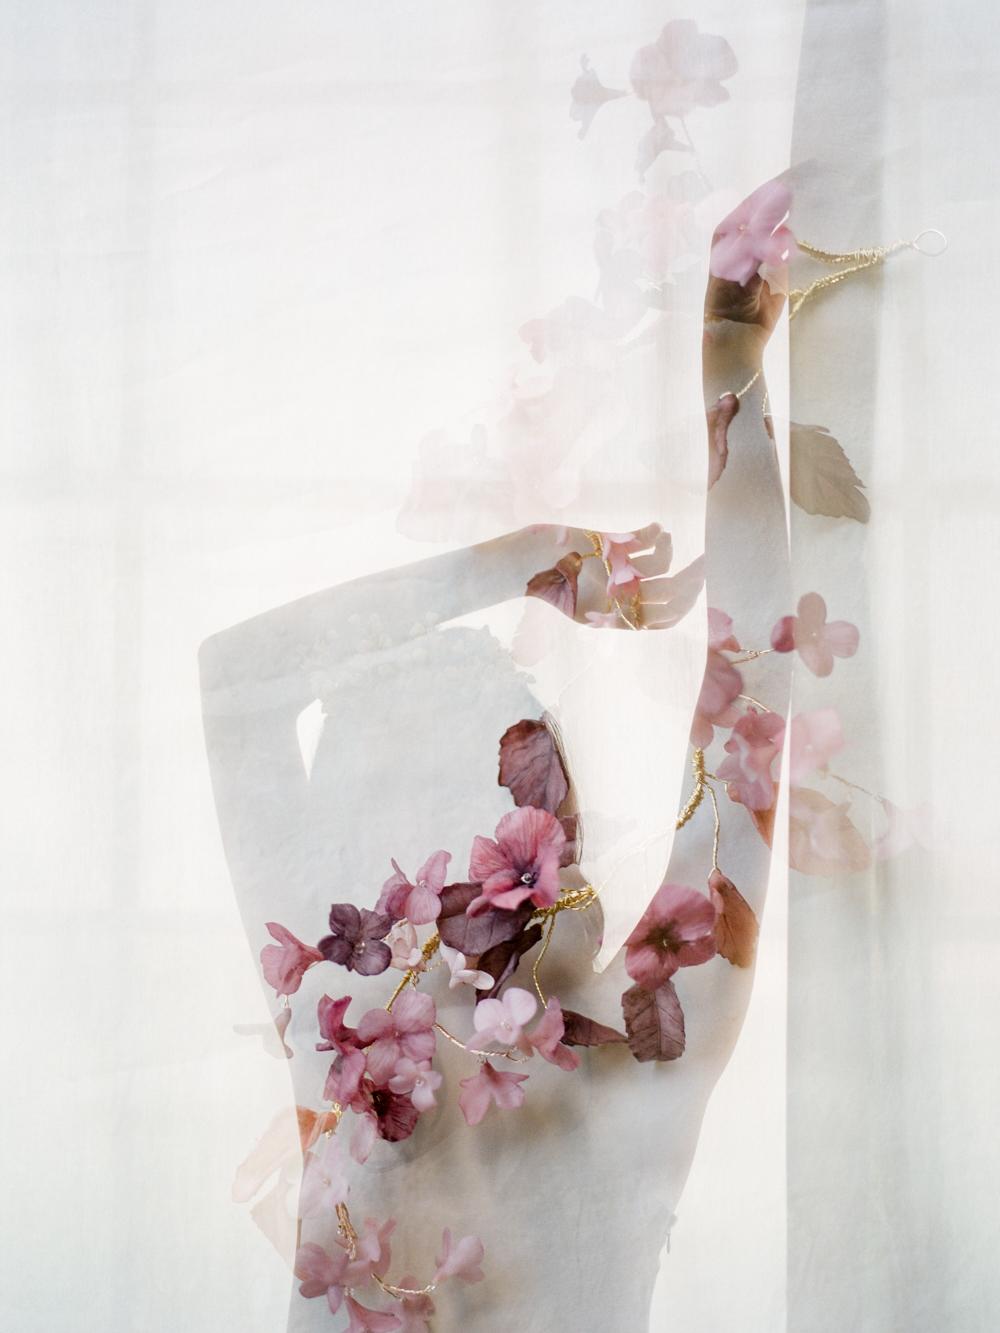 Christine Gosch - destination film photographer - houston wedding photographer - fine art film photographer - elopement photographer - destination wedding - understated wedding - simple beautiful wedding photography-51.jpg